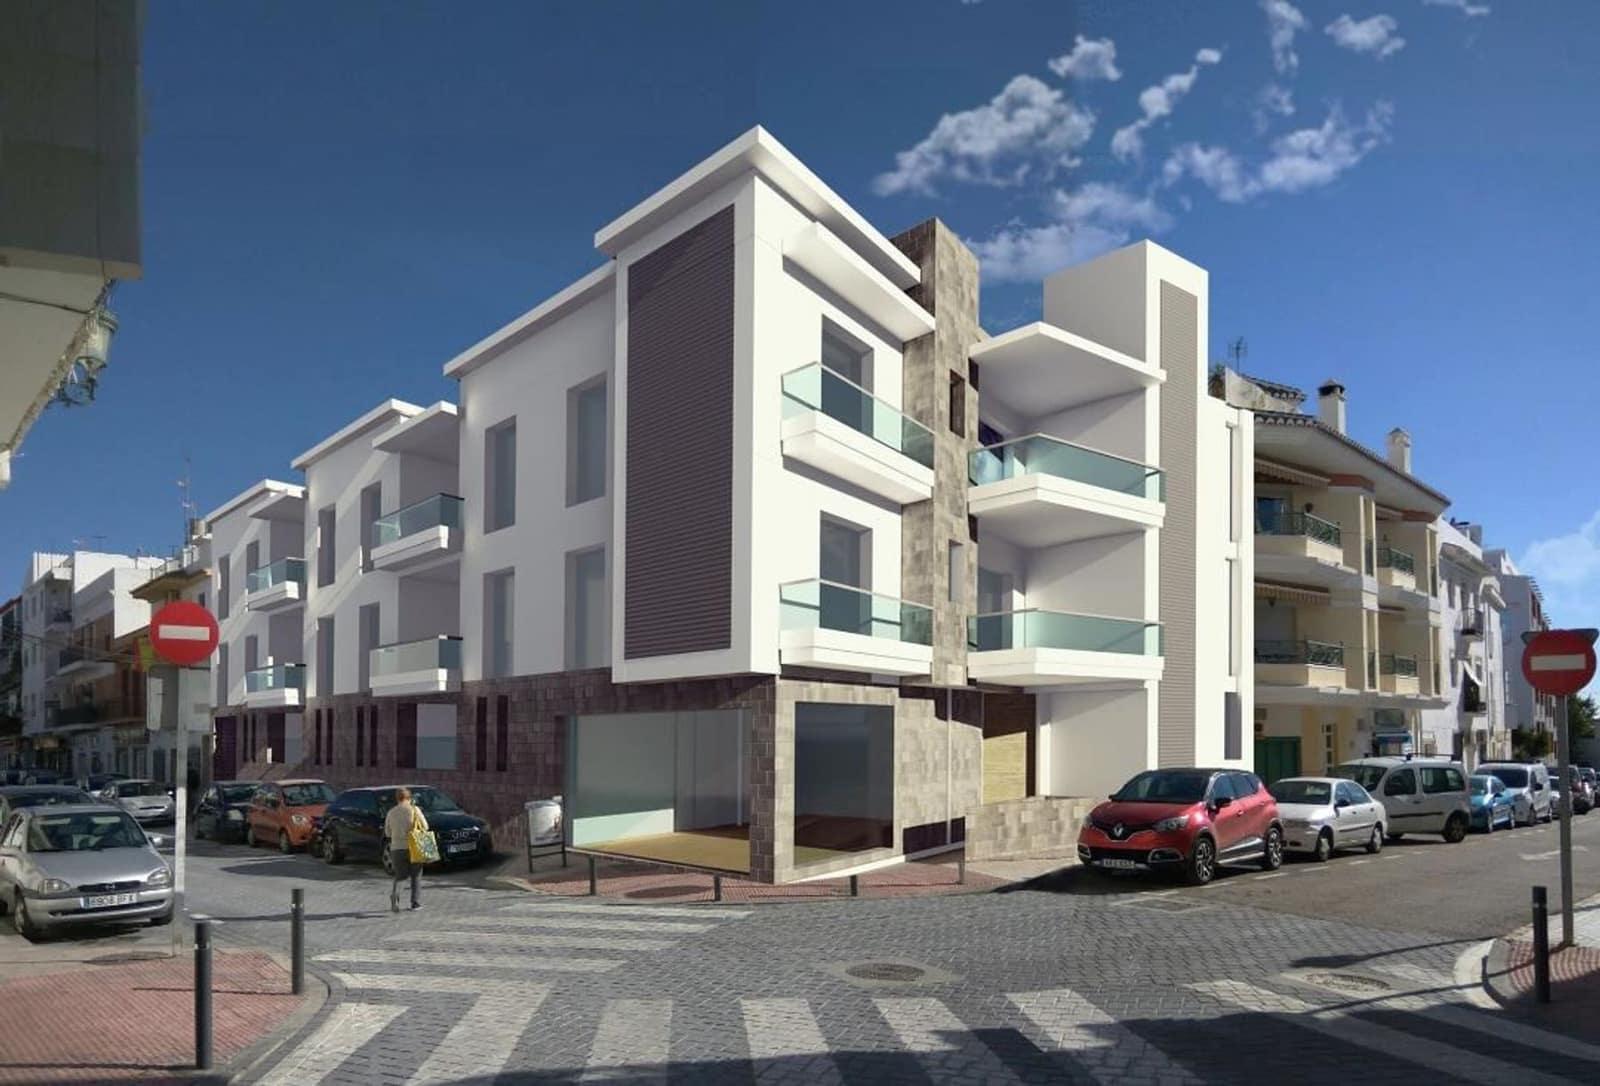 1 bedroom Apartment for sale in Nerja - € 197,500 (Ref: 5189301)